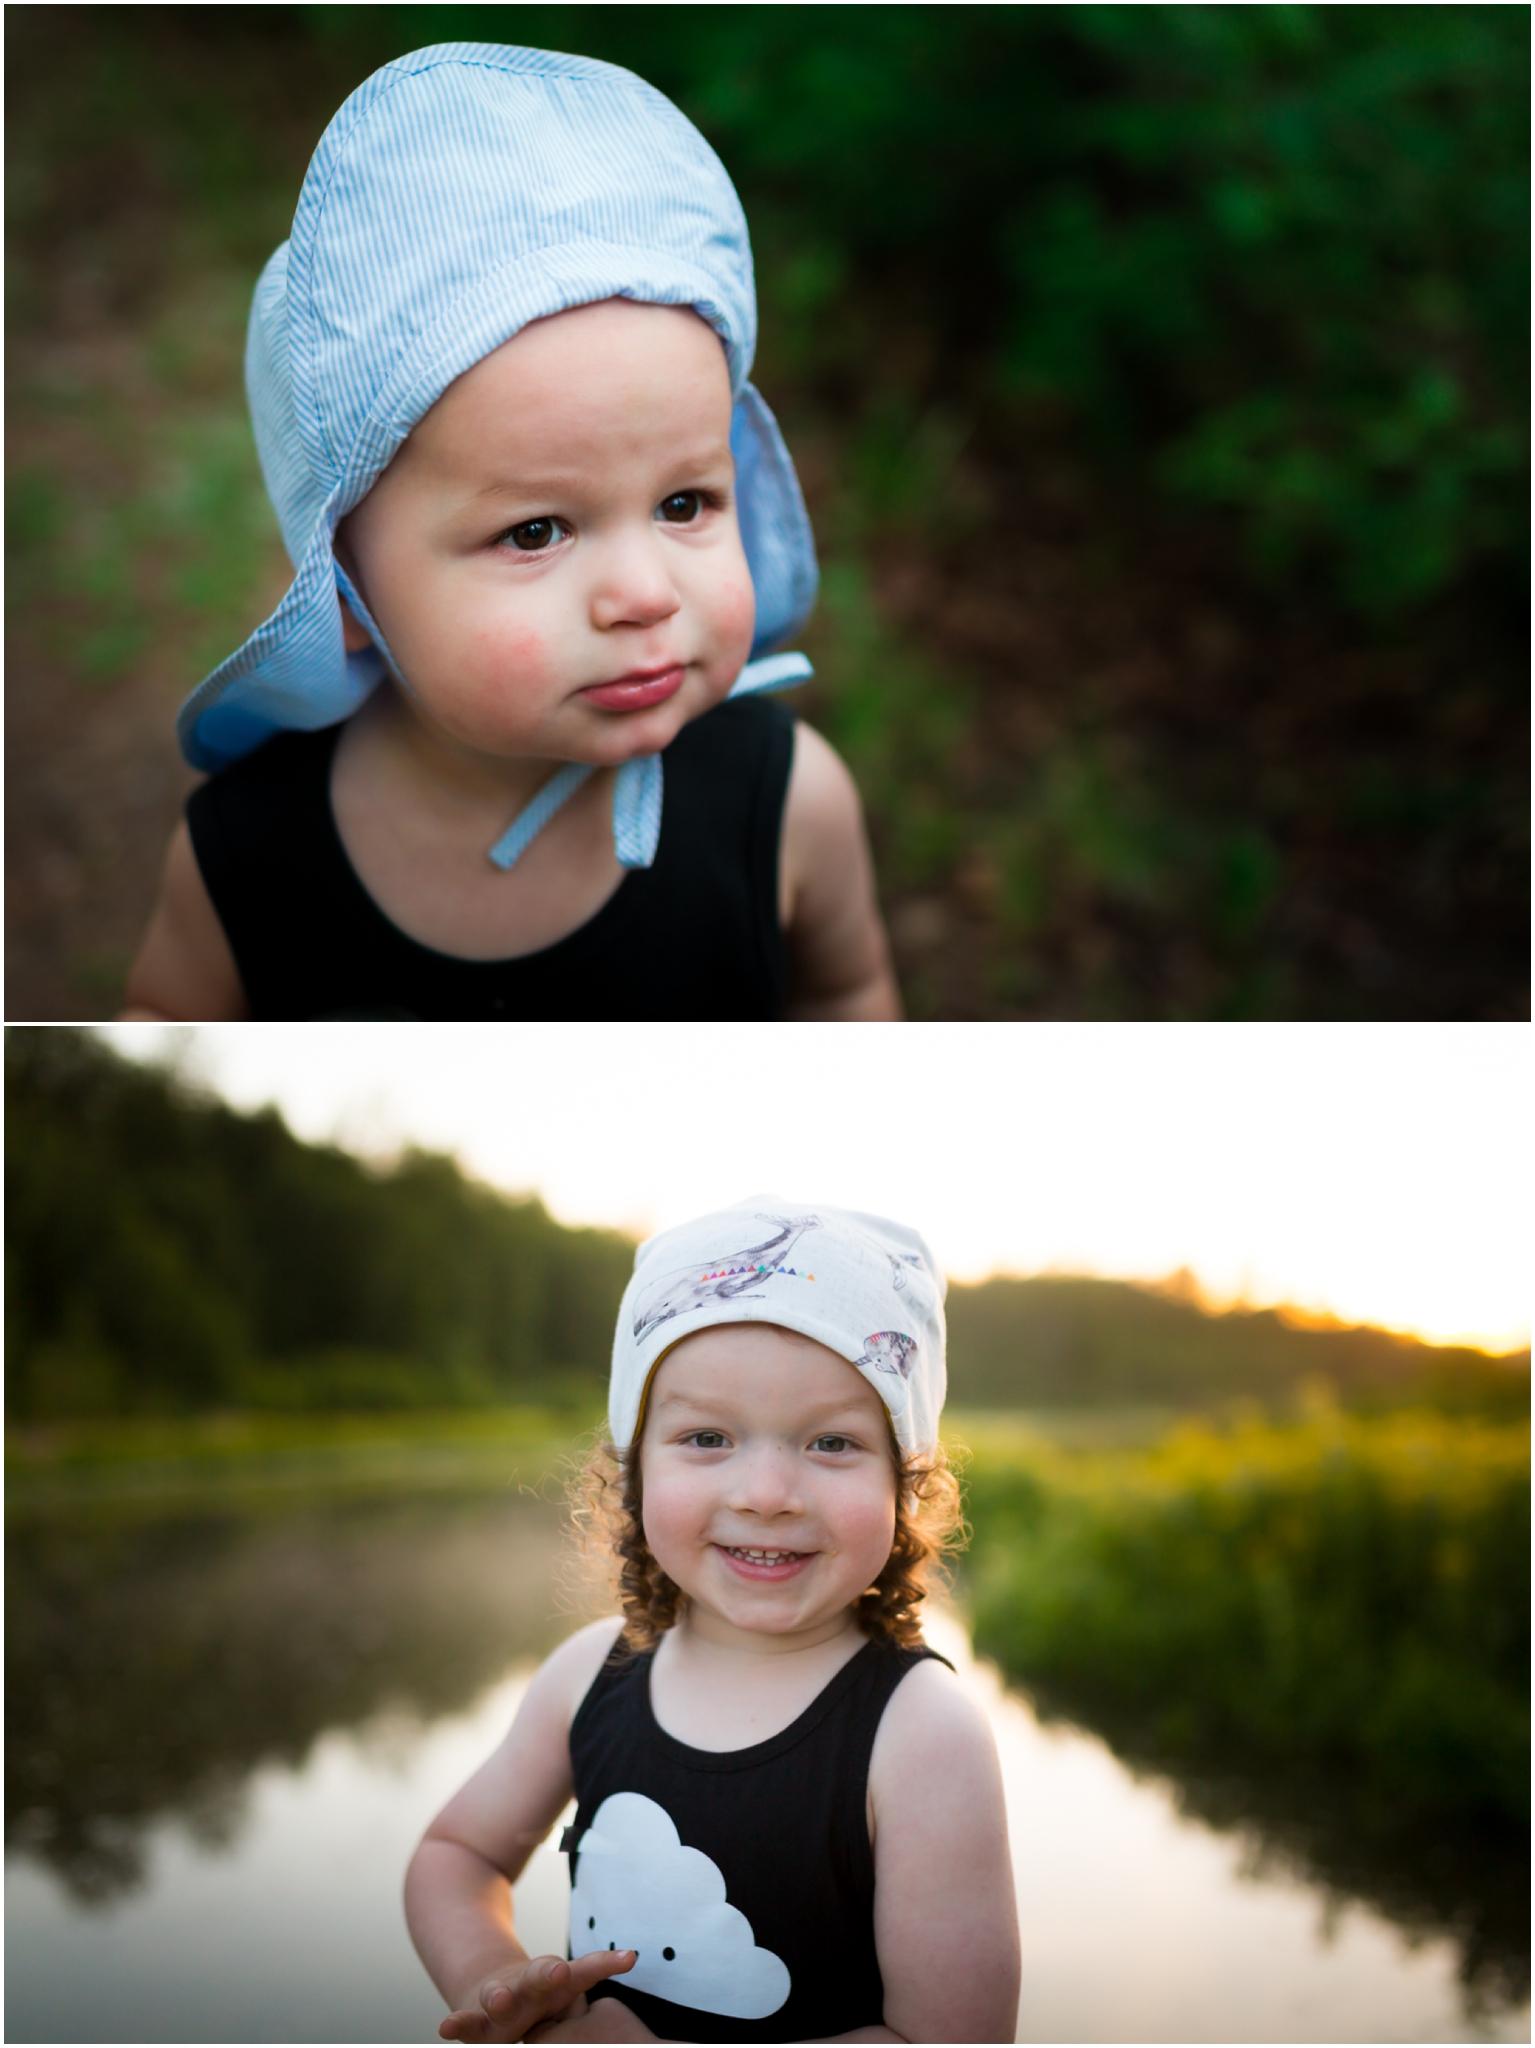 Edmonton Childrens Photographer - Best of 2016 - Portraits - Brothers - Kids